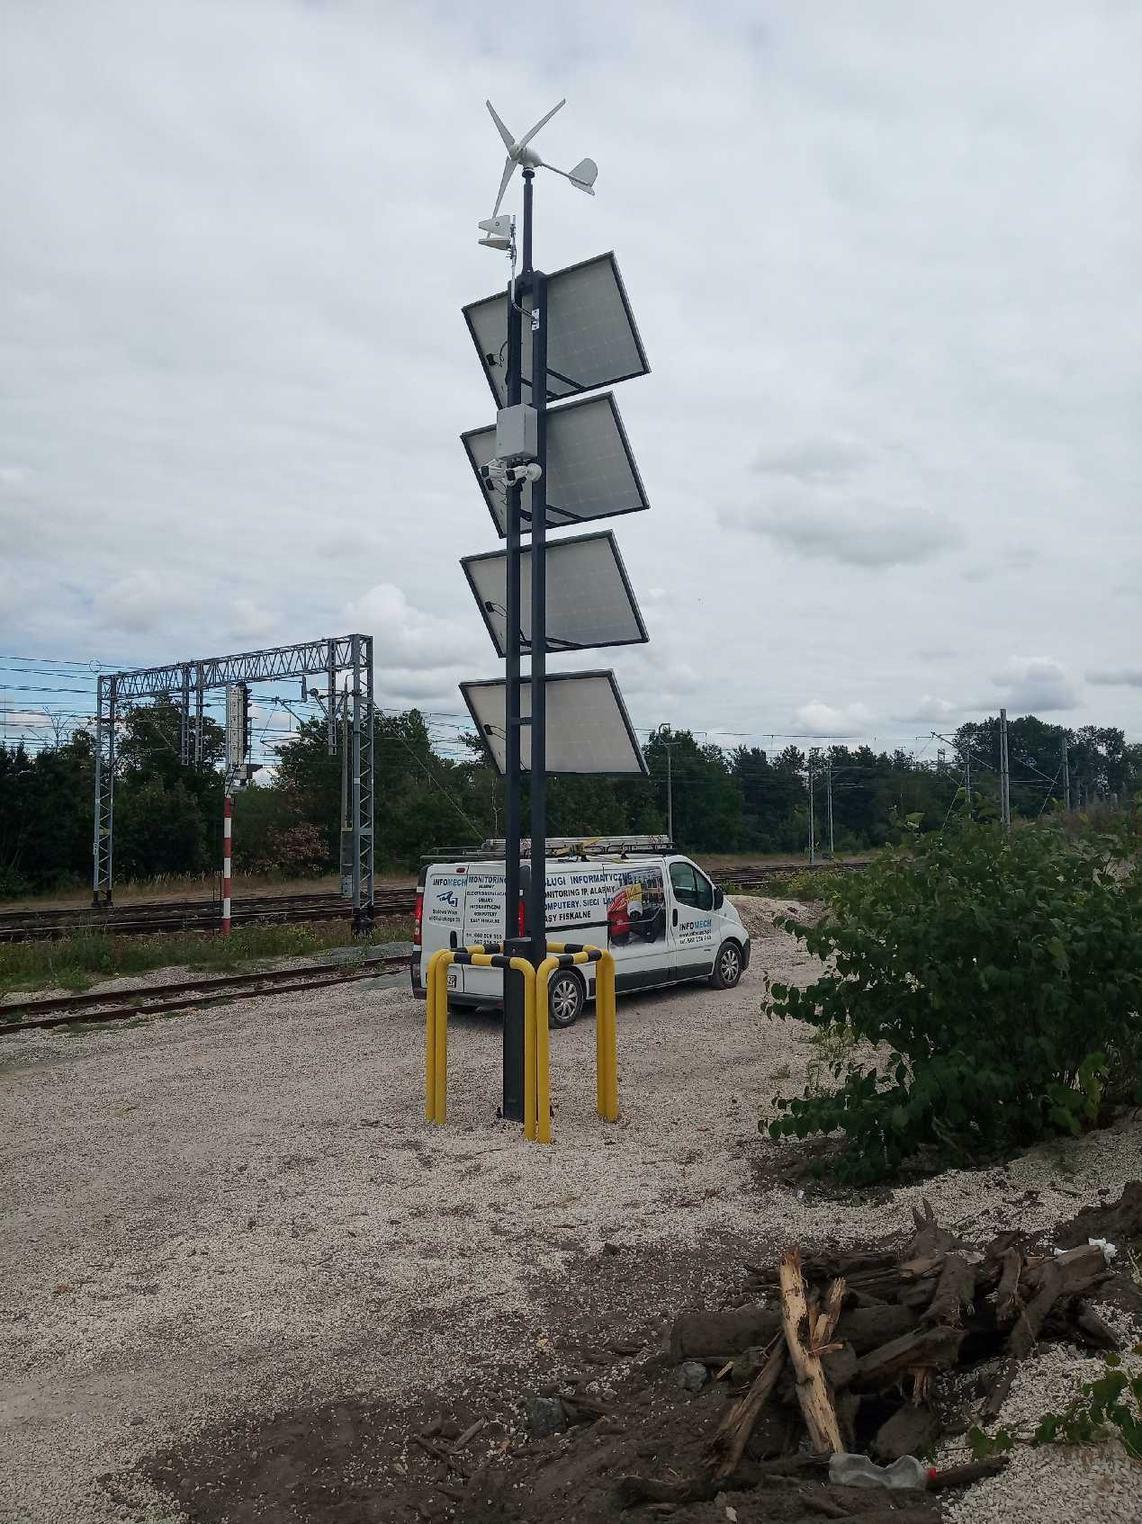 Elektrownia OZE Monitoring CCTV LTE MASZT - montaż, instalacja, produkcja